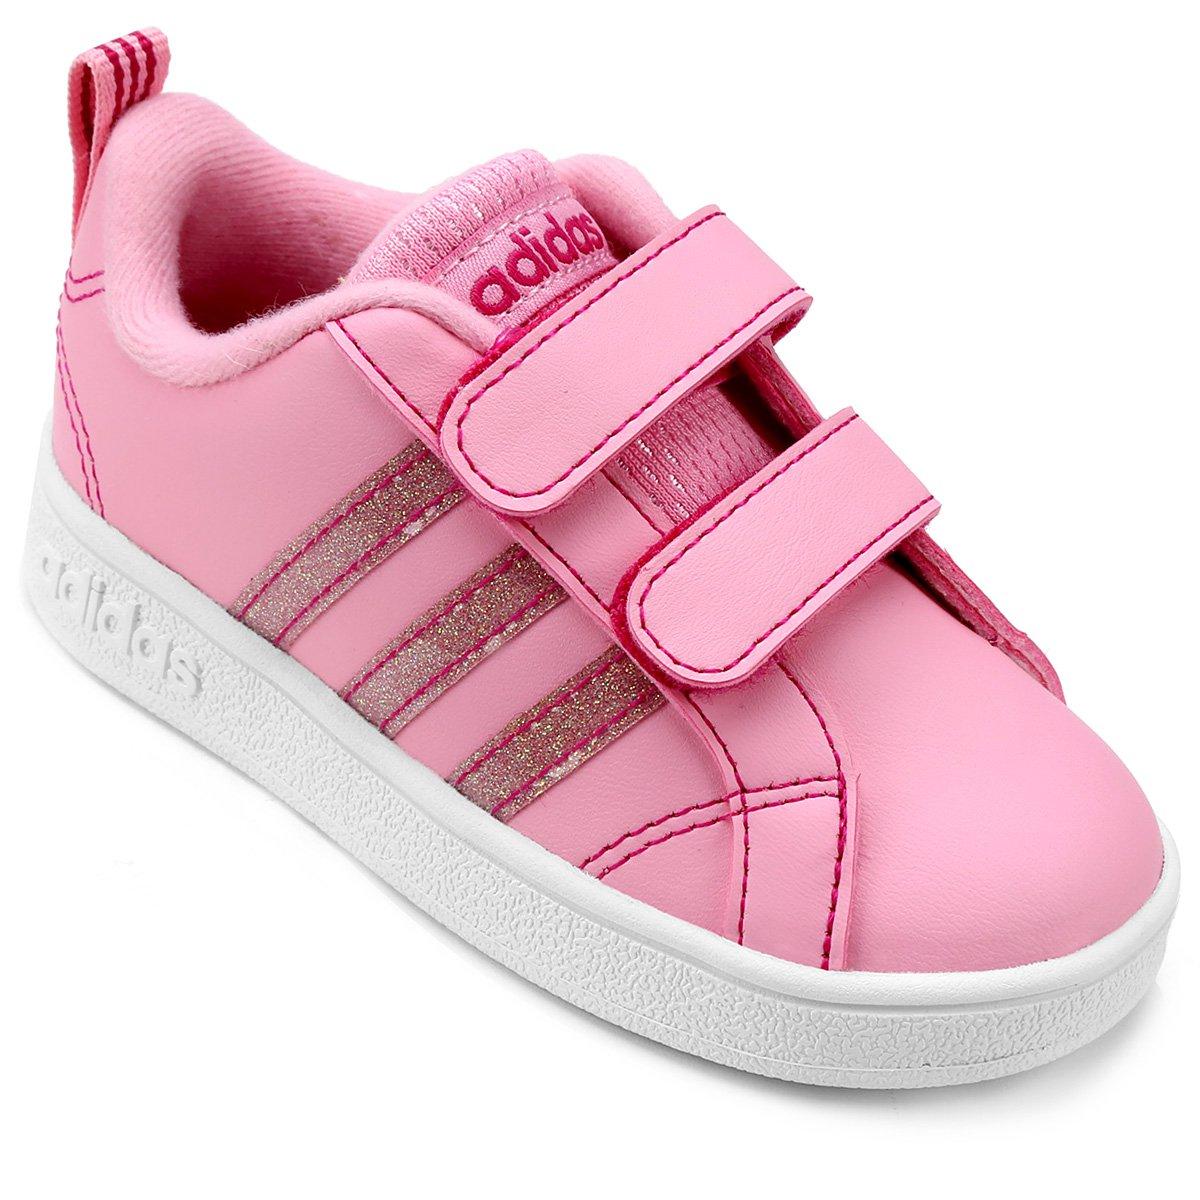 Tênis Infantil Adidas Vs Advantage Cmf - Compre Agora  35339b96ba460